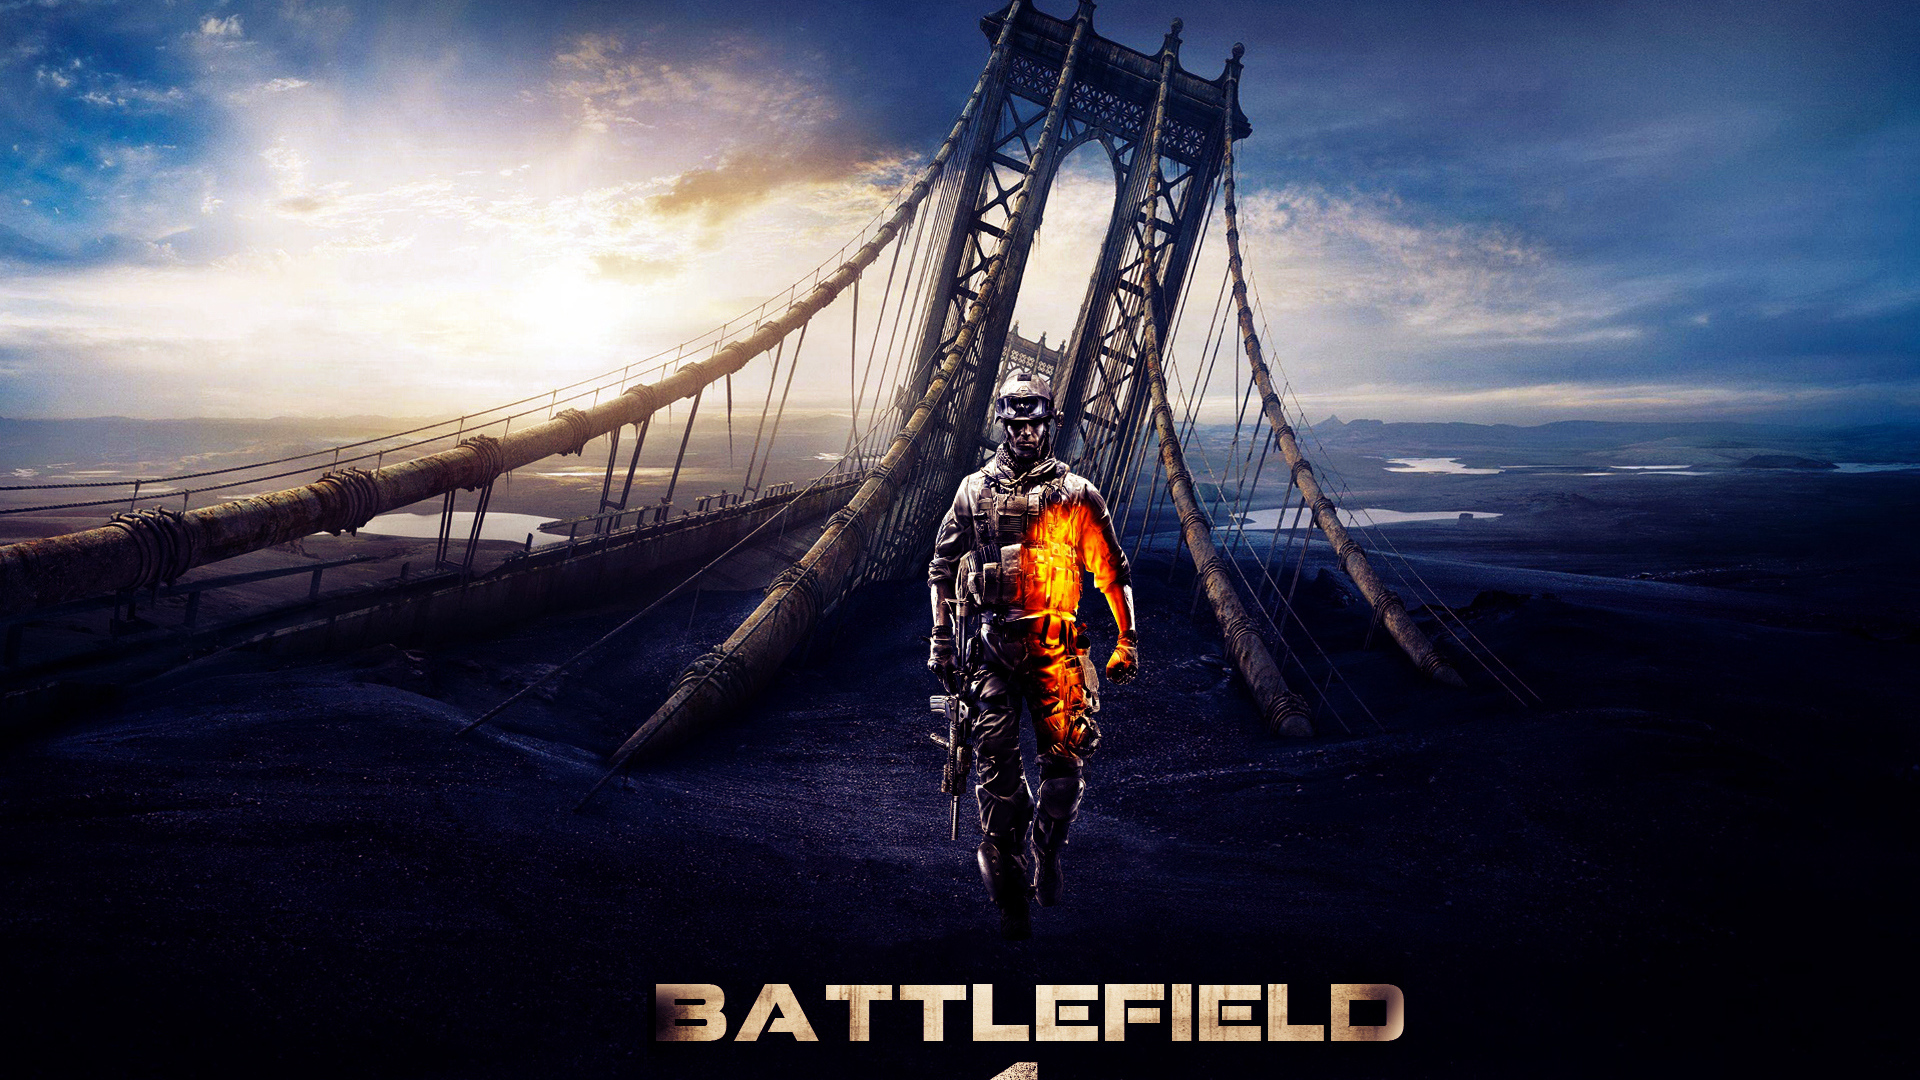 45+ Battlefield 4 Animated Wallpapers on WallpaperSafari